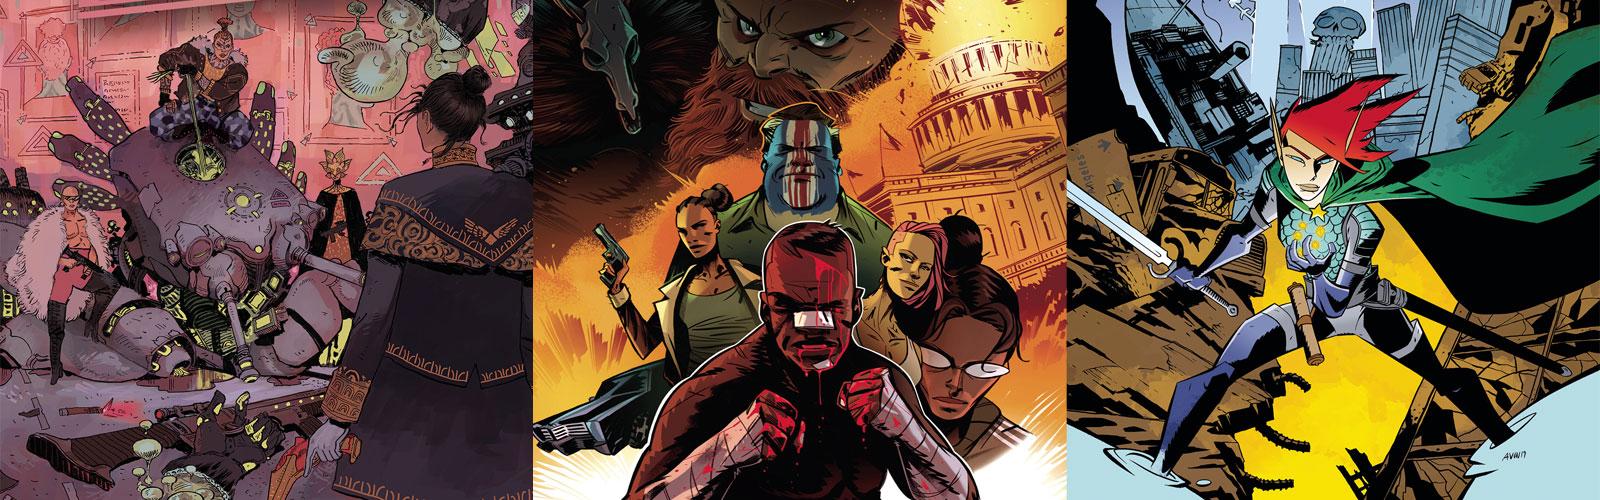 Solicitations: February 2020 – Image Comics